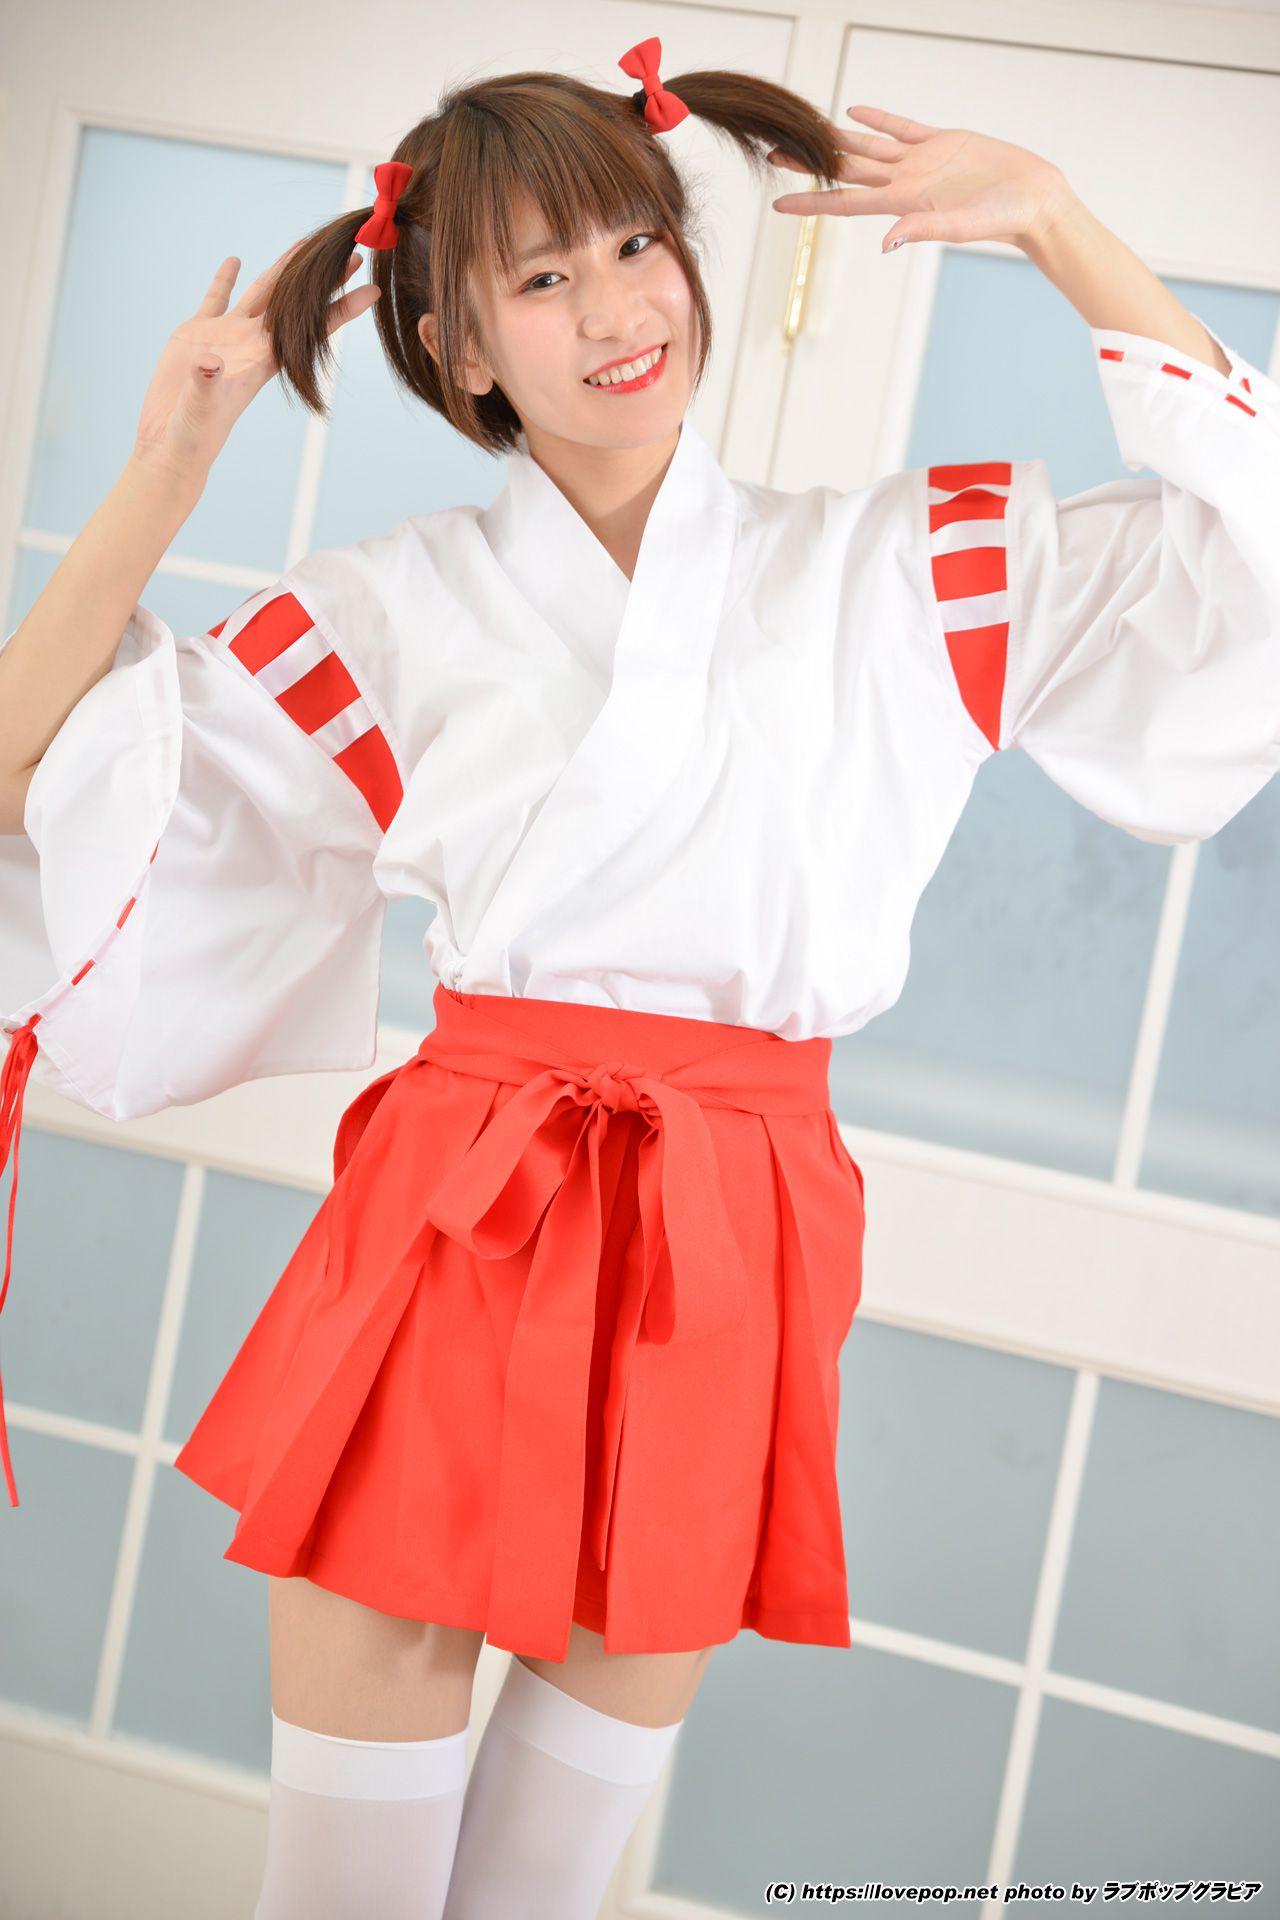 [LOVEPOP] Usako Kurusu 来栖うさこ Photoset 01 写真集[68P]插图(8)